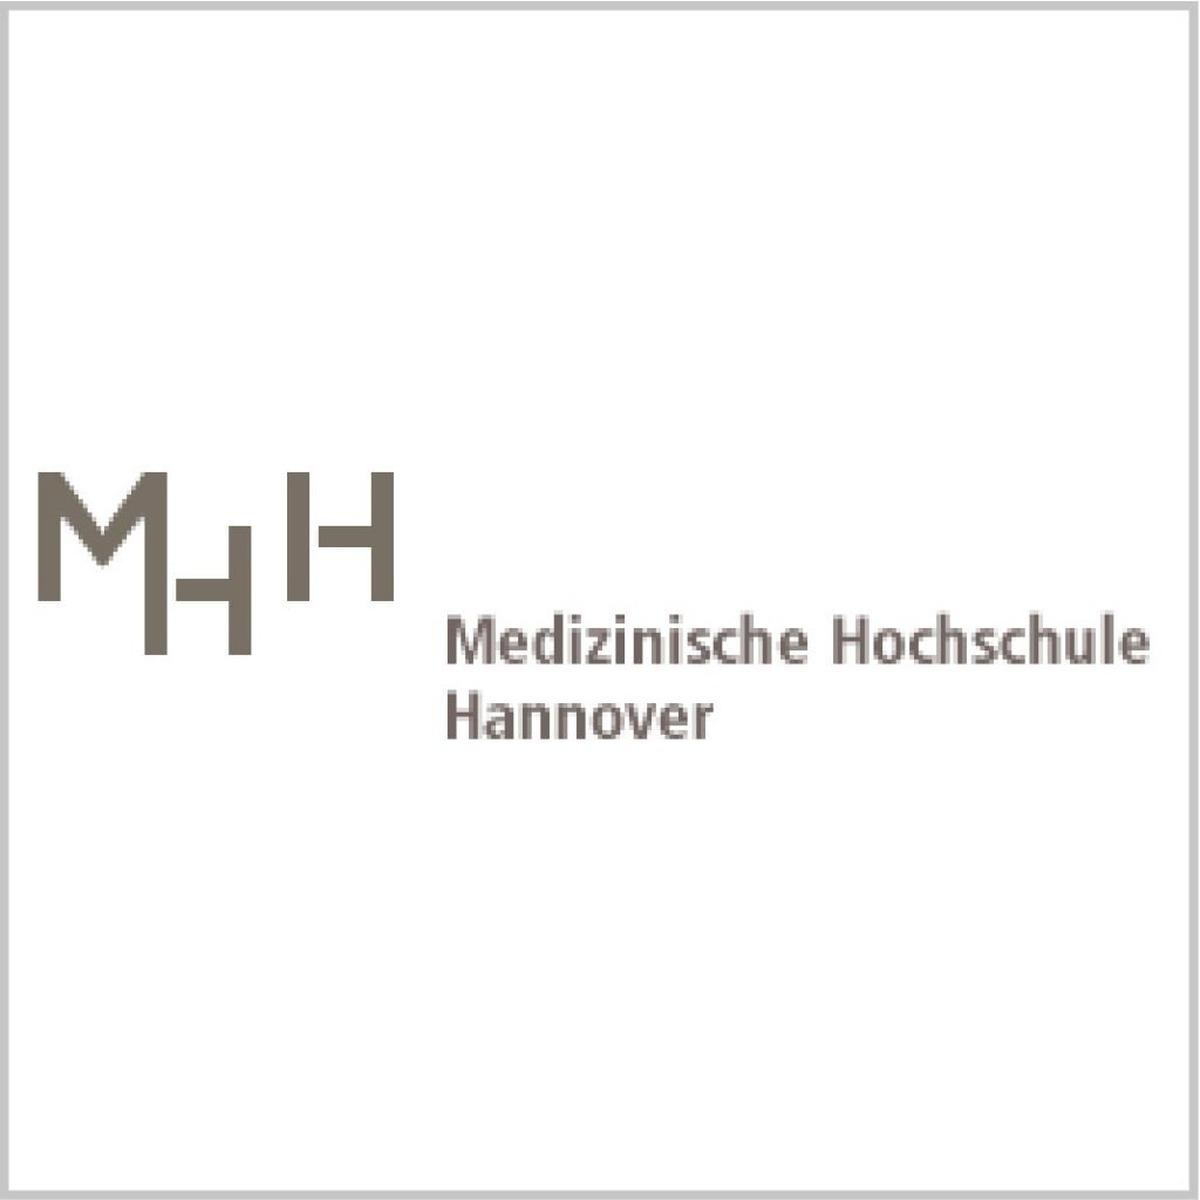 Homepage-Manager/innen (m/w/d) und Multimediaredakteure/-innen (m/w/d)